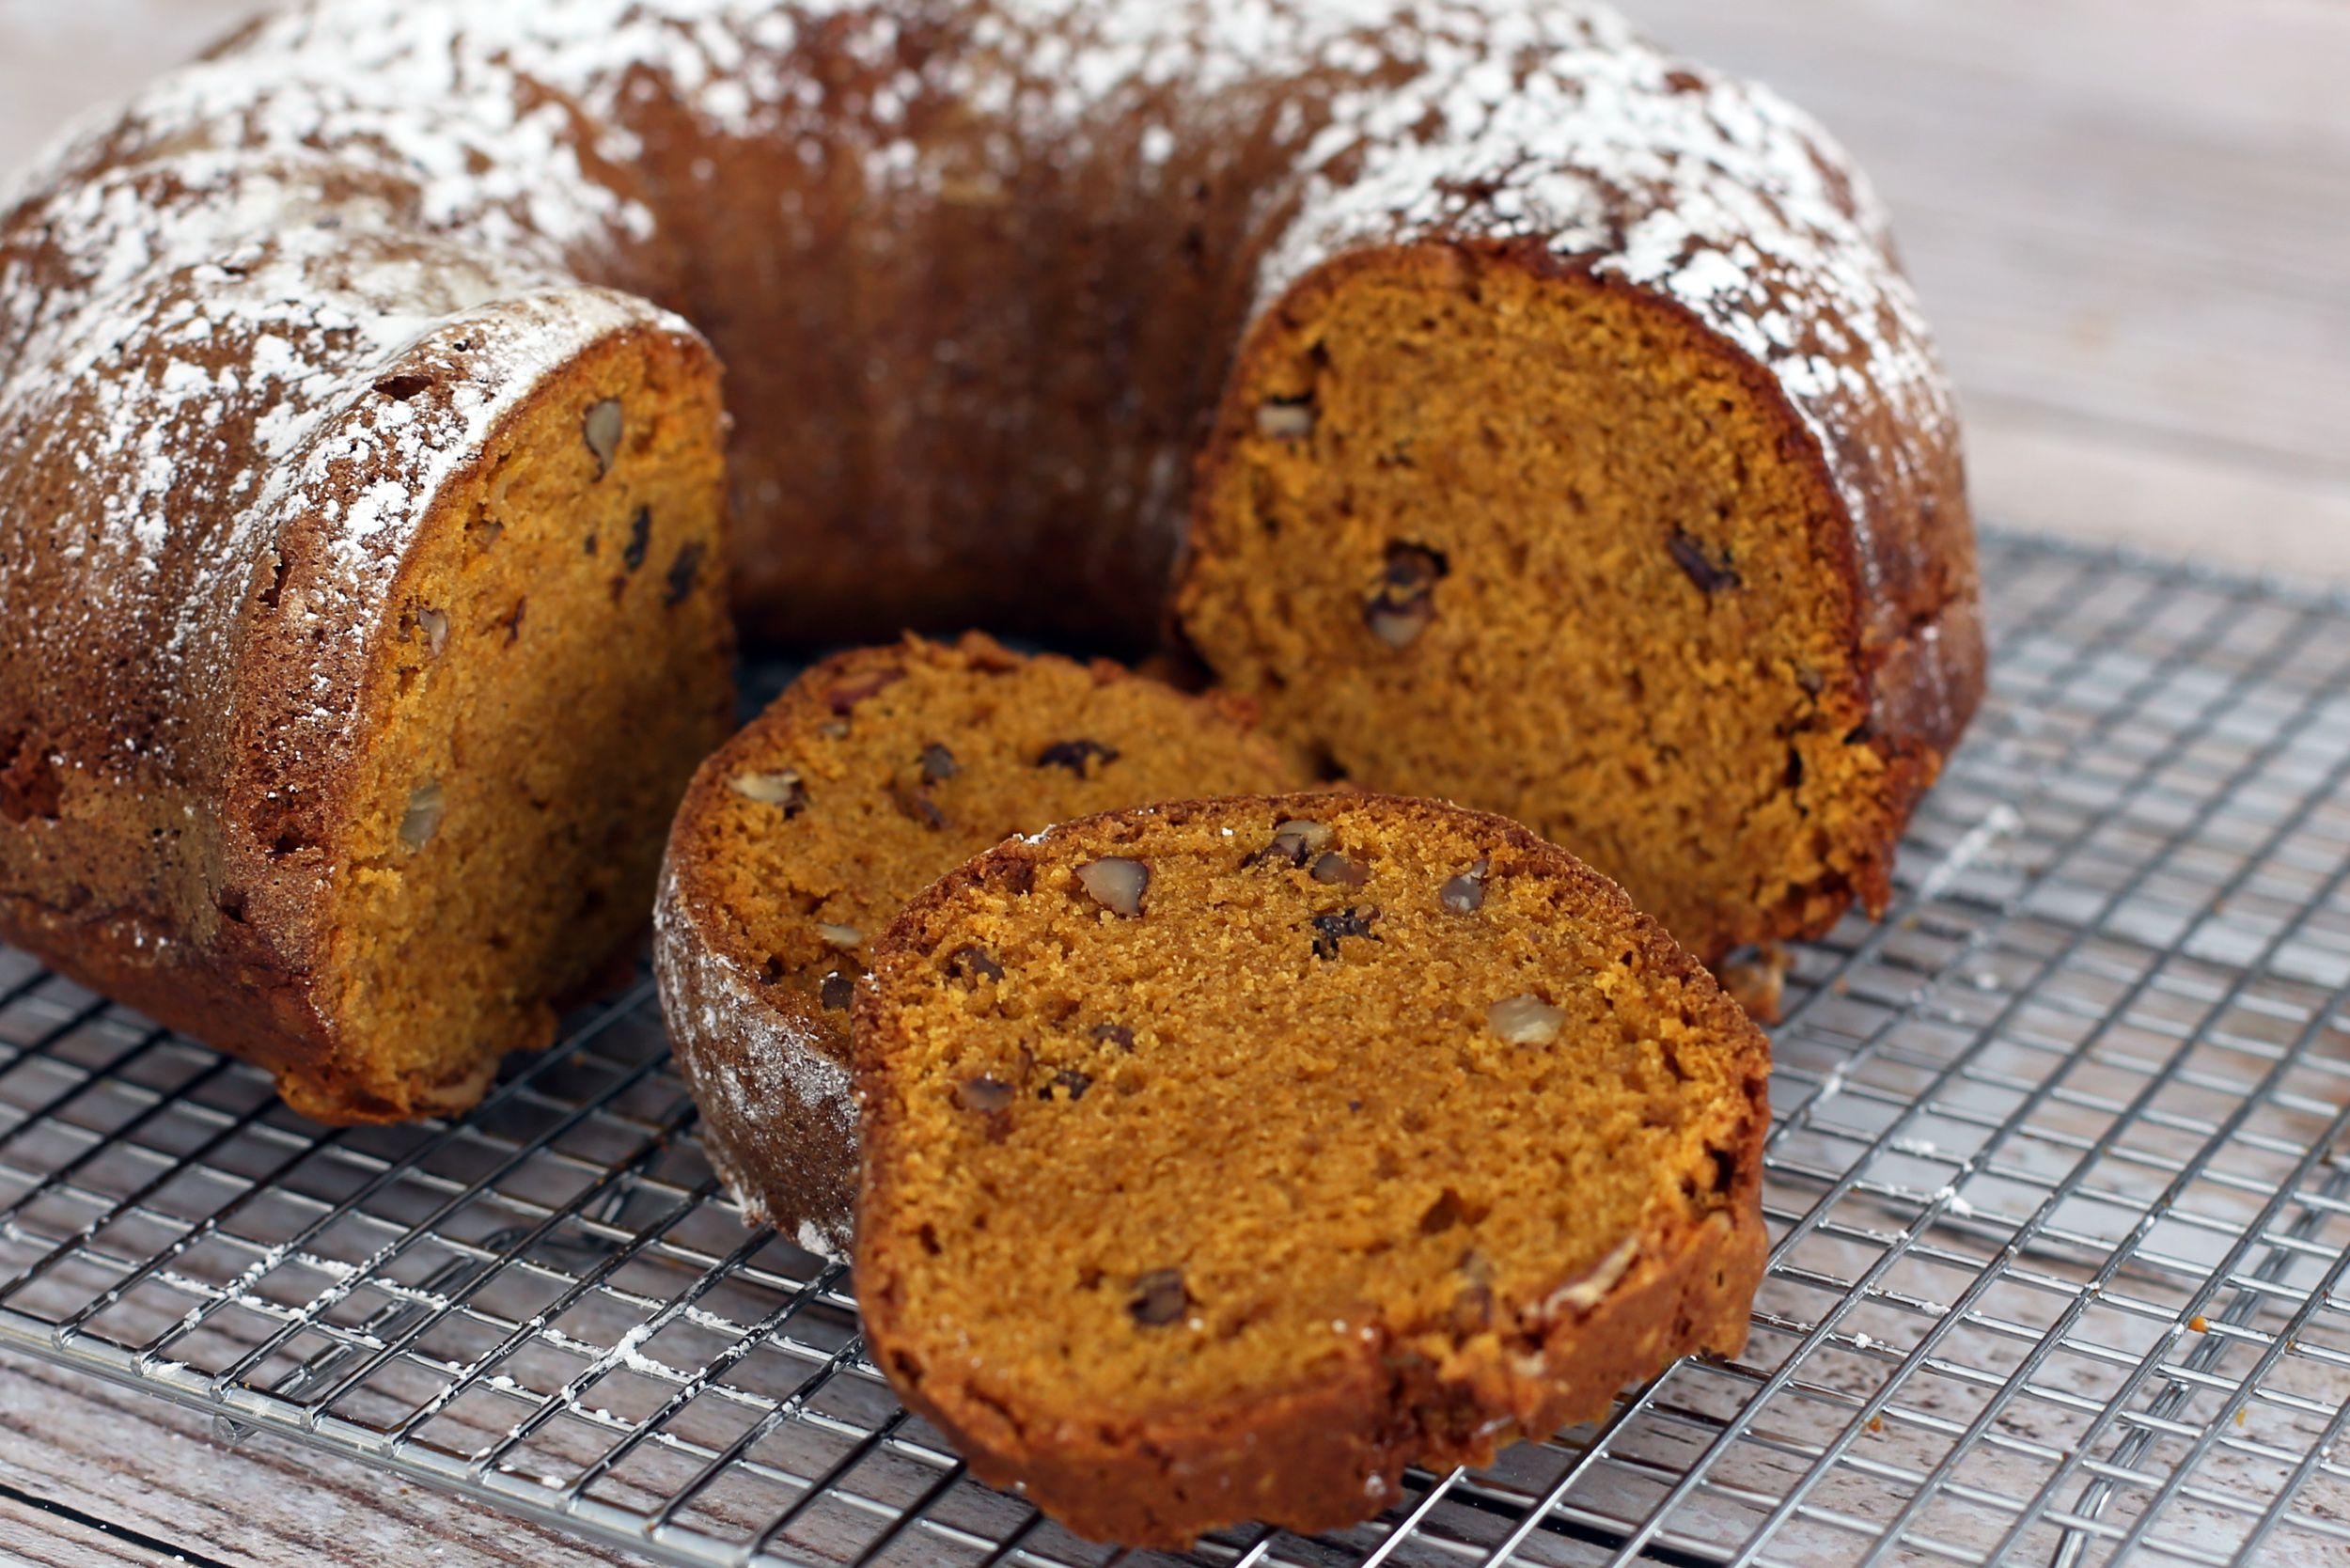 Spiced Pumpkin Bread With Walnuts And Raisins